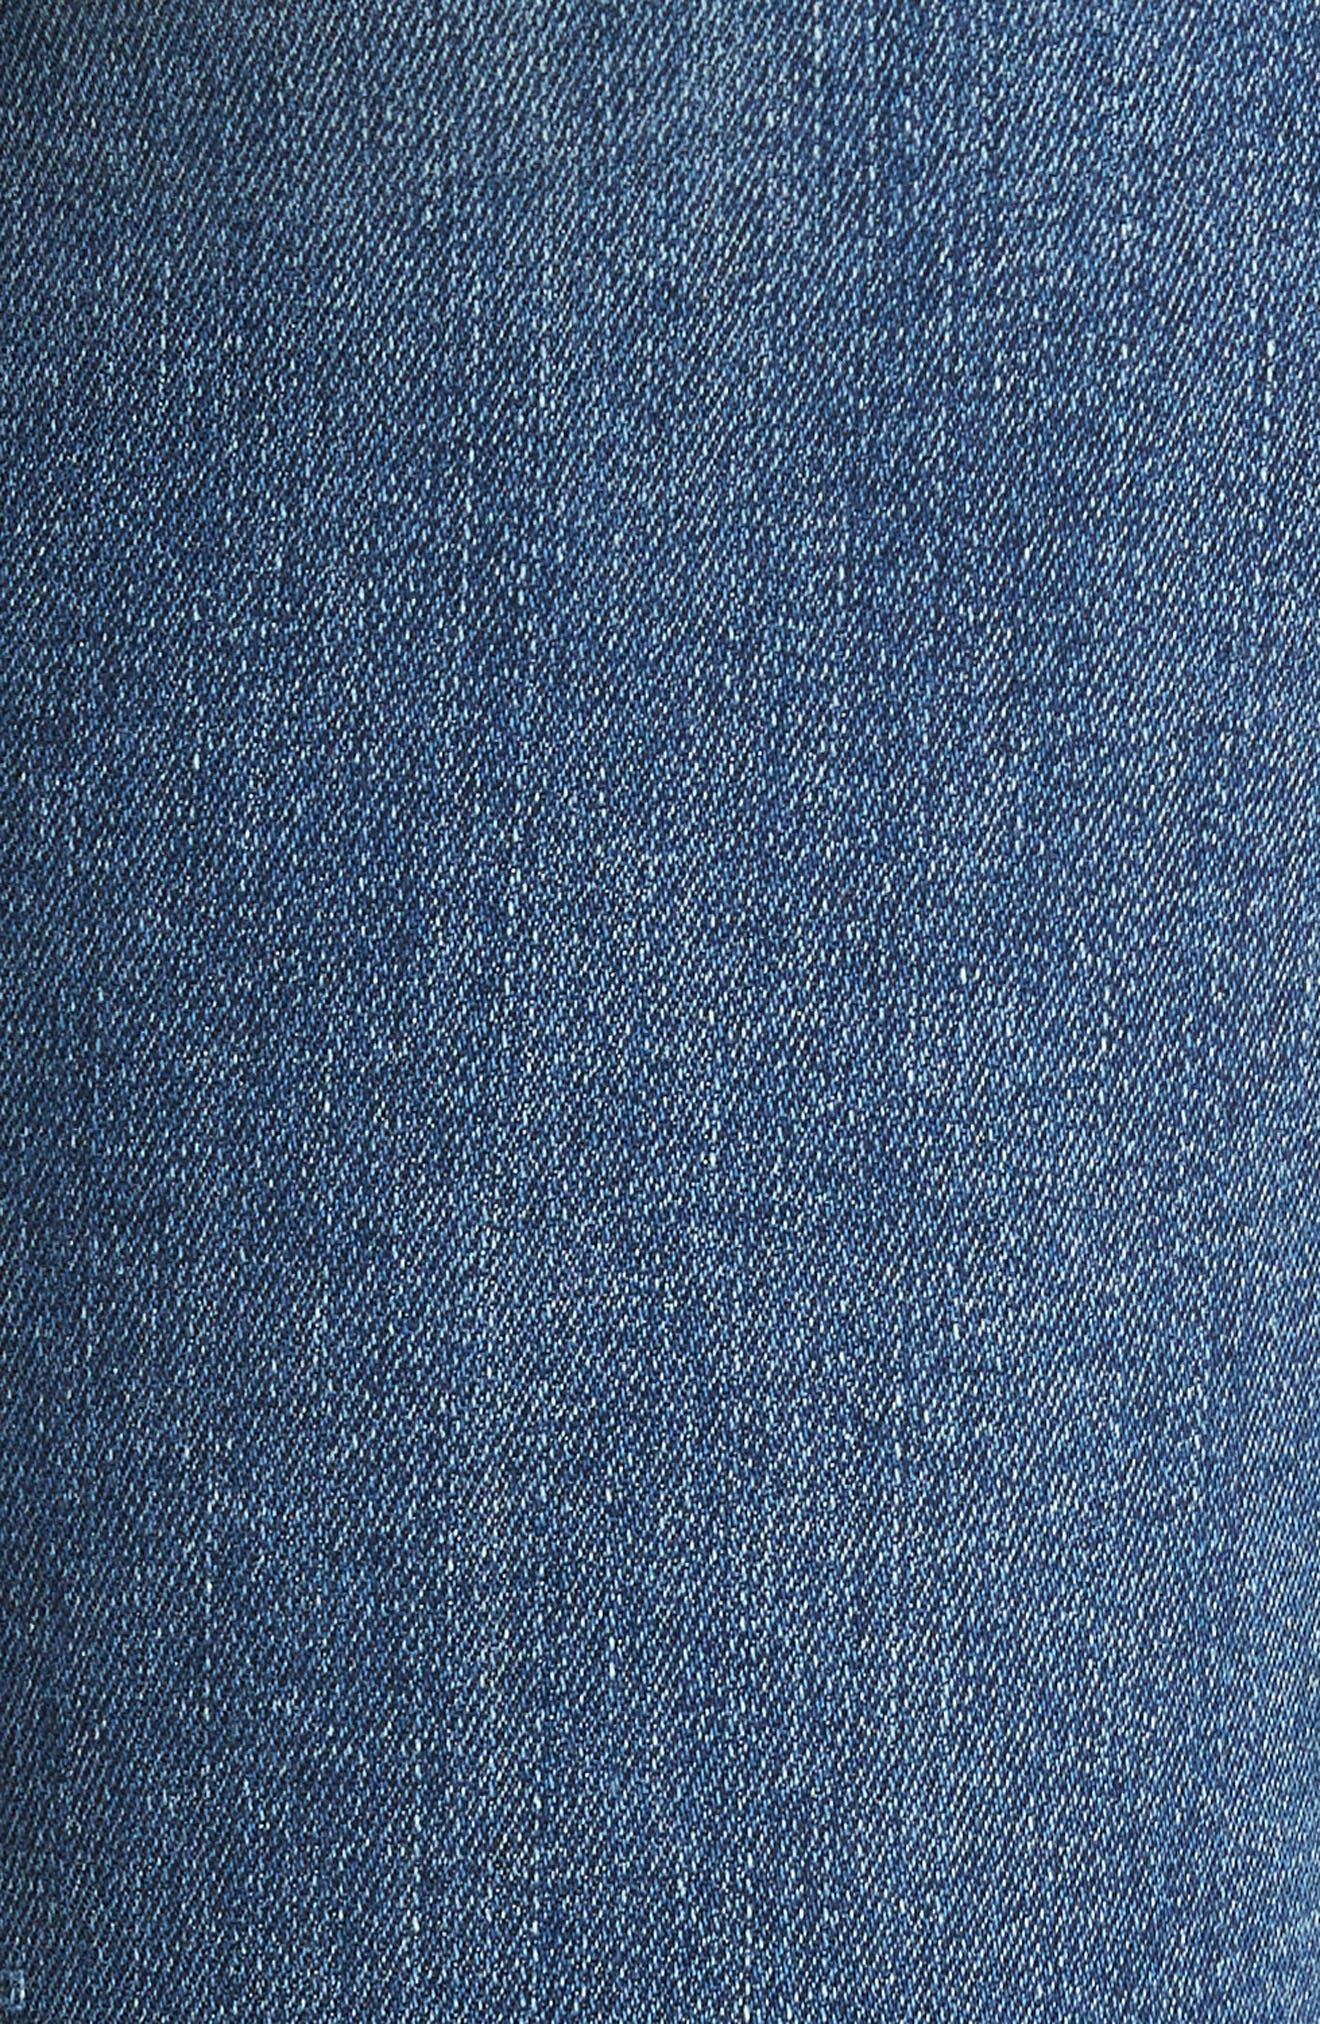 Transcend Vintage - Verdugo Crop Ultra Skinny Jeans,                             Alternate thumbnail 6, color,                             Bloomfield